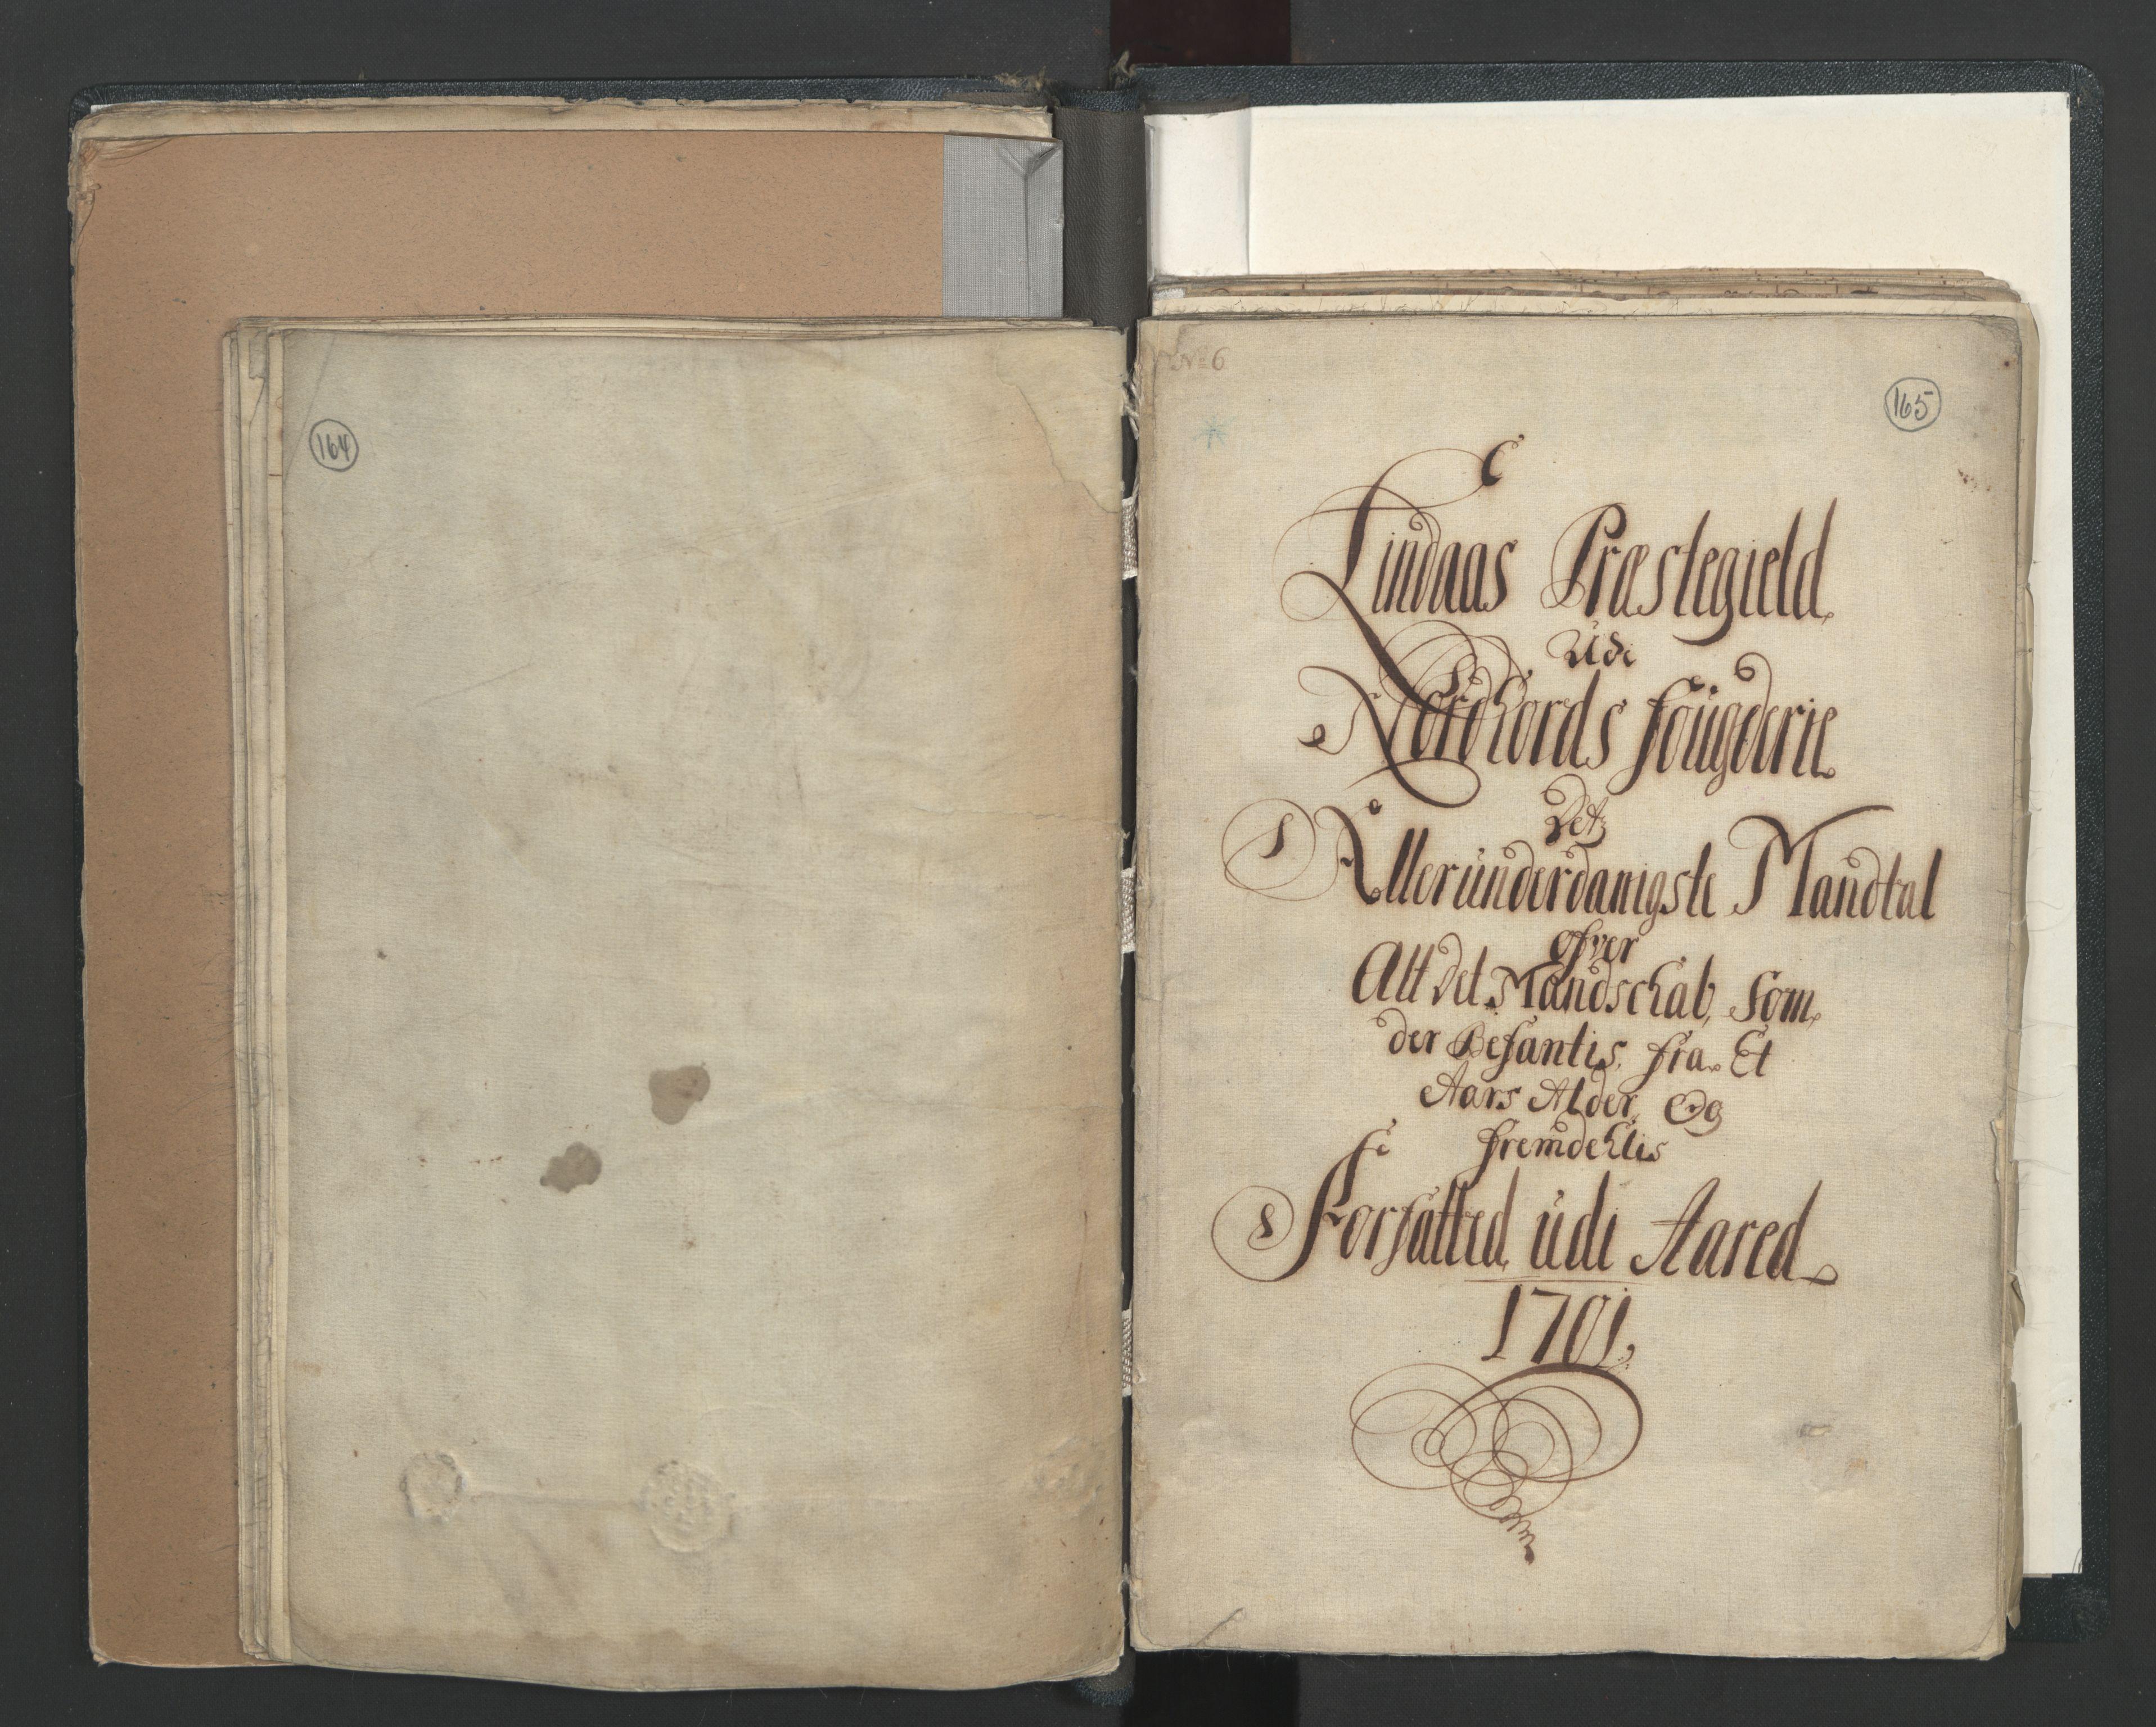 RA, Manntallet 1701, nr. 7: Nordhordland og Voss fogderi, 1701, s. 164-165